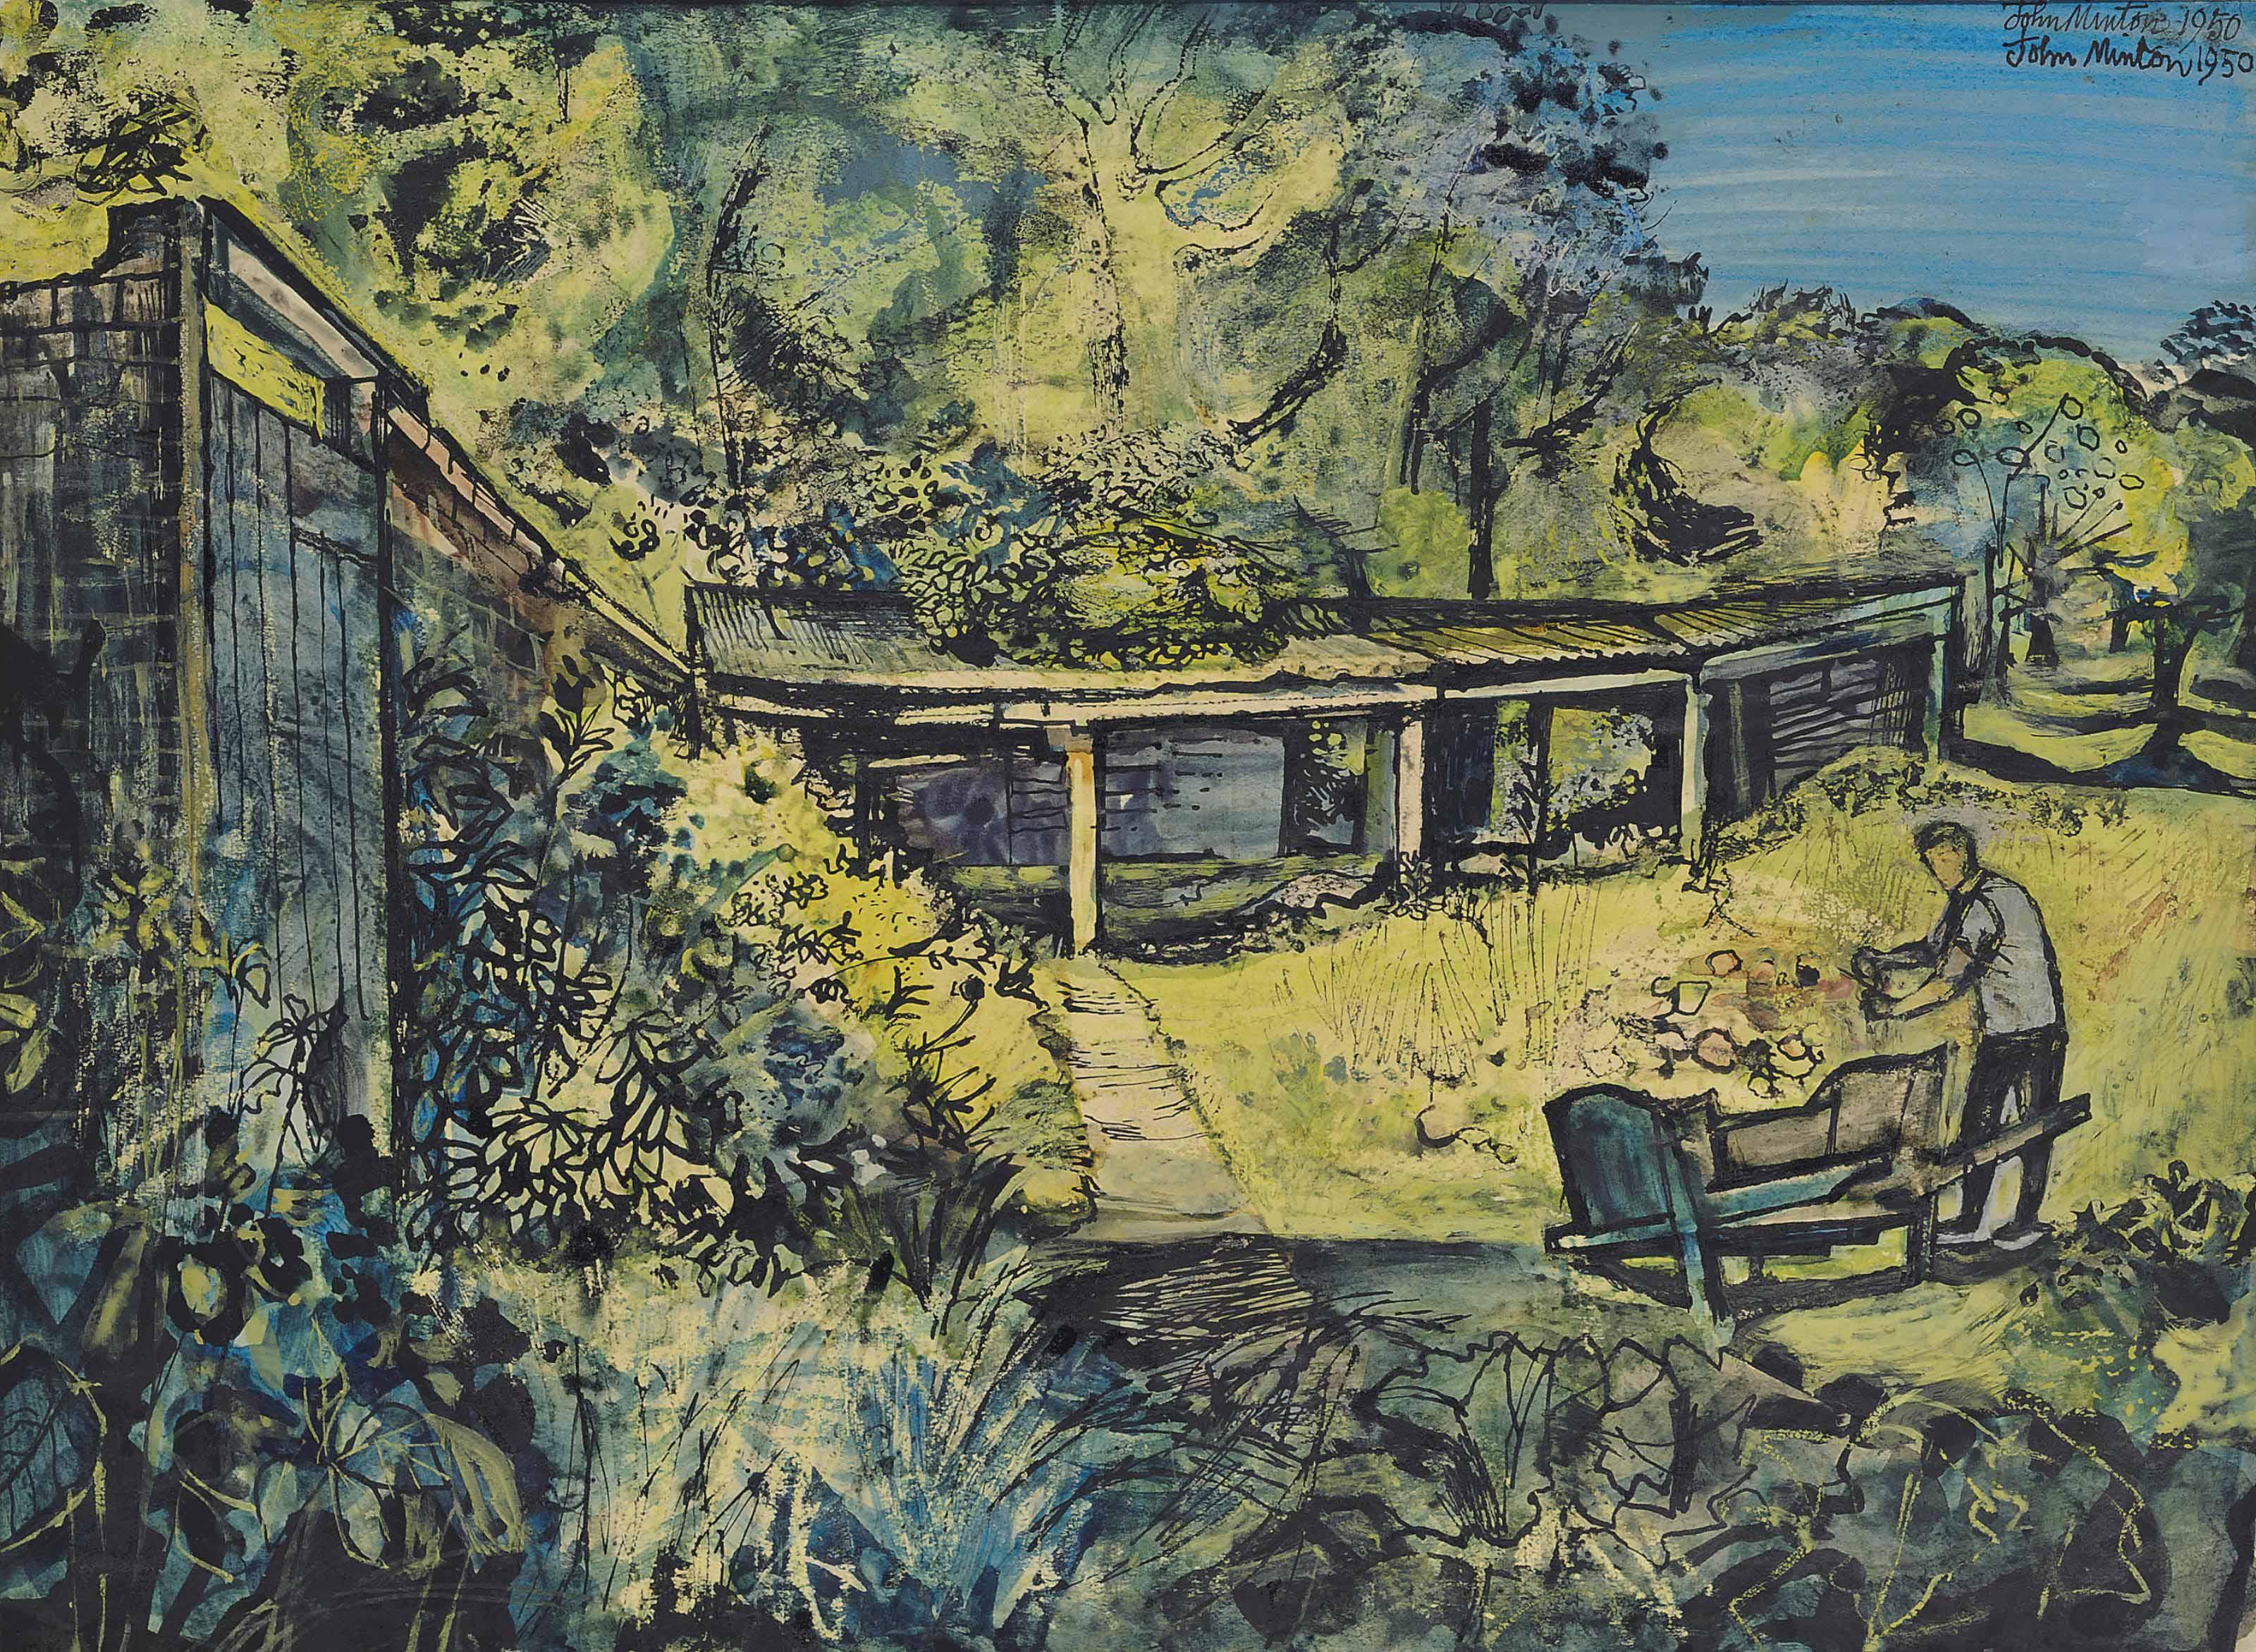 Summer Landscape (1950) - John Minton